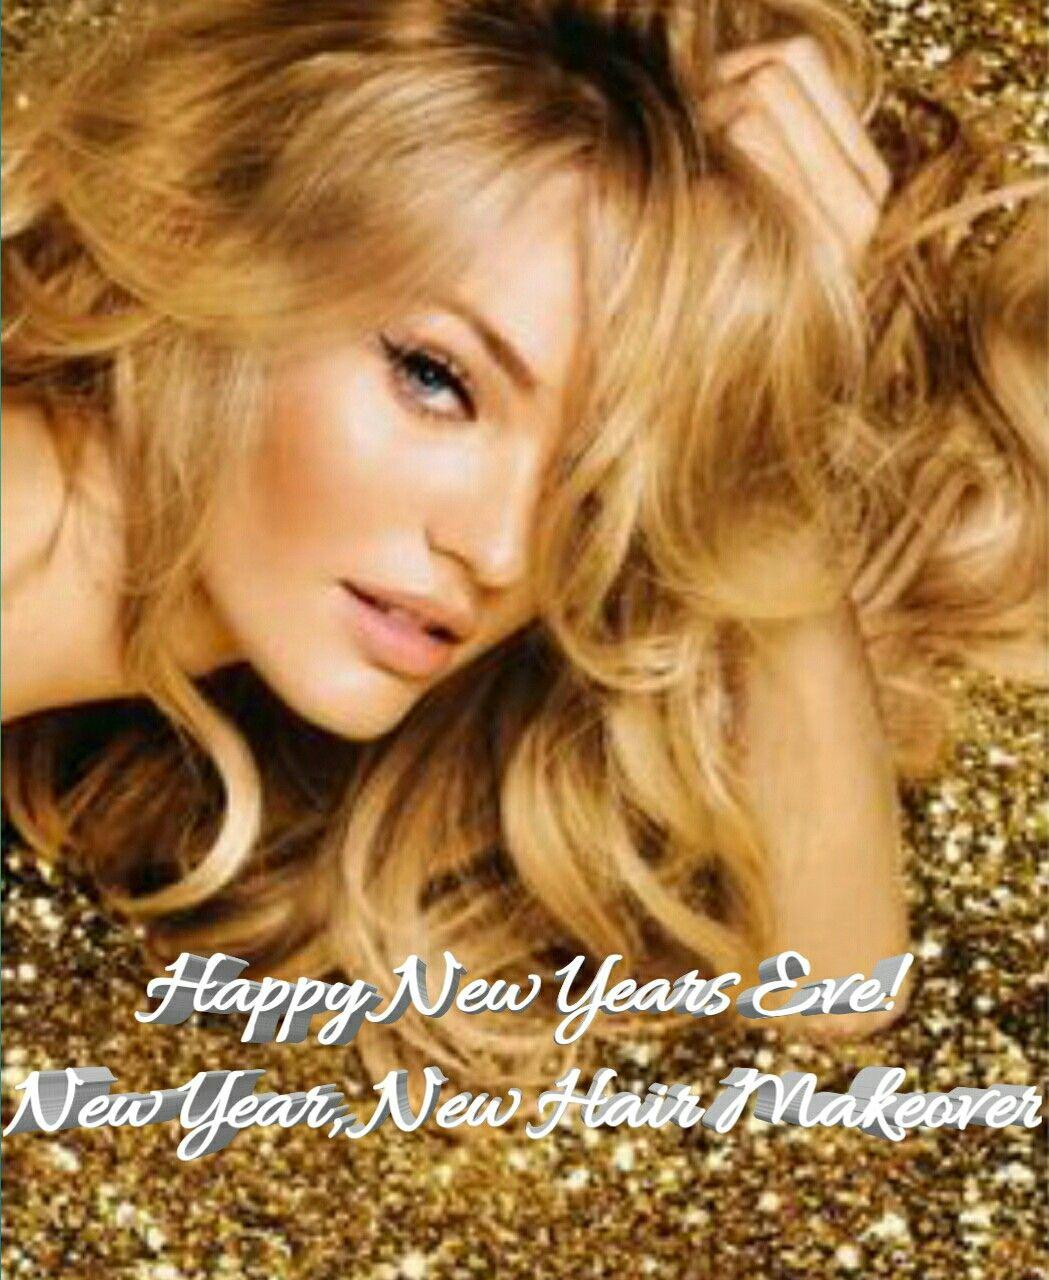 <3 New Year, New Hair Makeover <3    #HoneyLocks #honeylockshair #hairextensions #nondamaginghairextensions #hair #longhair #beautiful #diy  #empowered #luscious #instagood #sallybeauty #diyhairextensions #hairlove #newyears2017